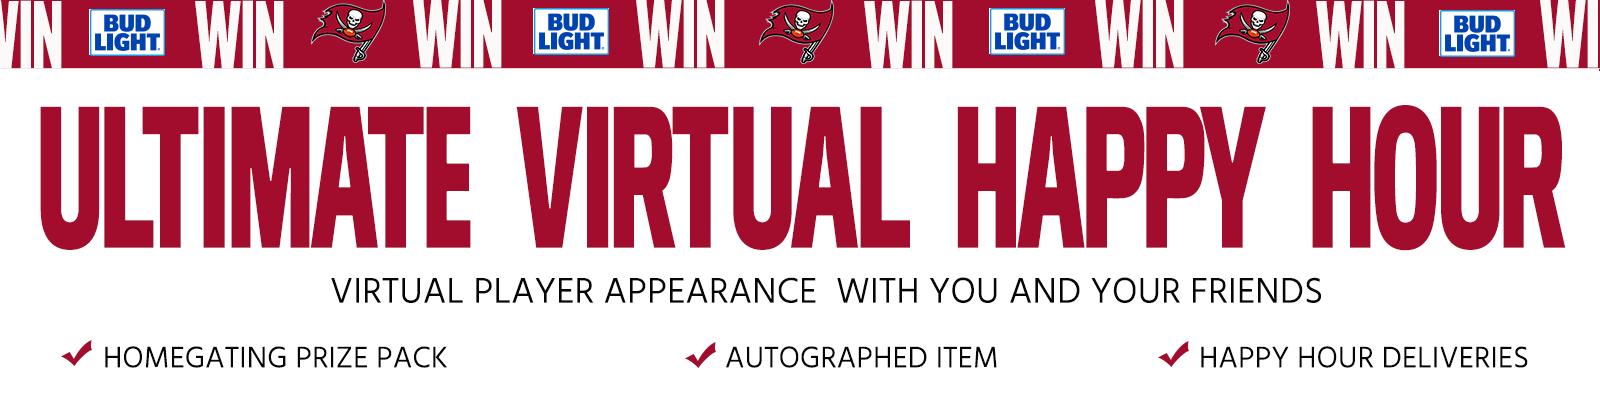 ultimate virtual happy hour